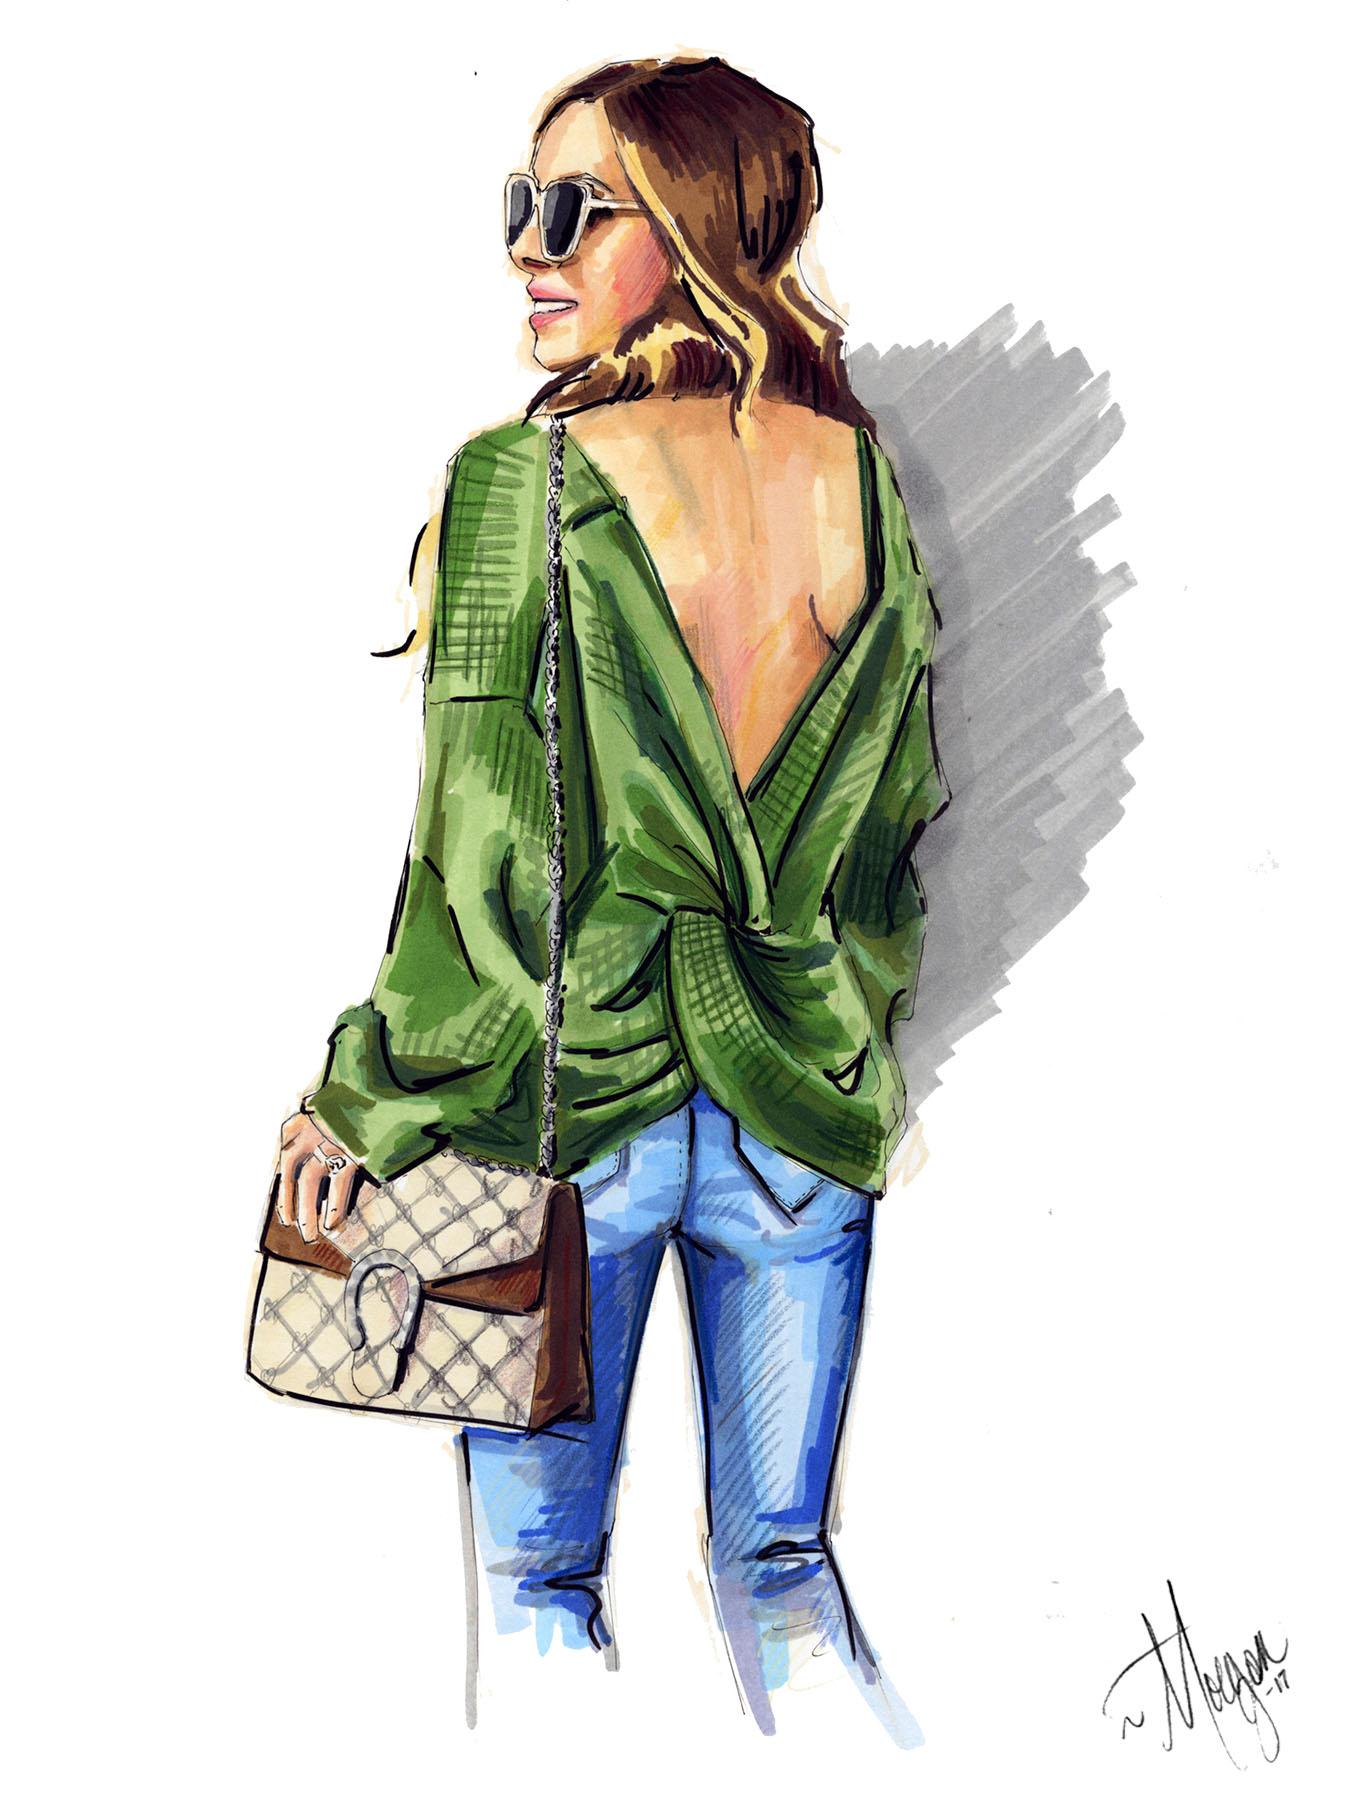 back-knot-sweater-illustration-morgan-swank-studio.jpg